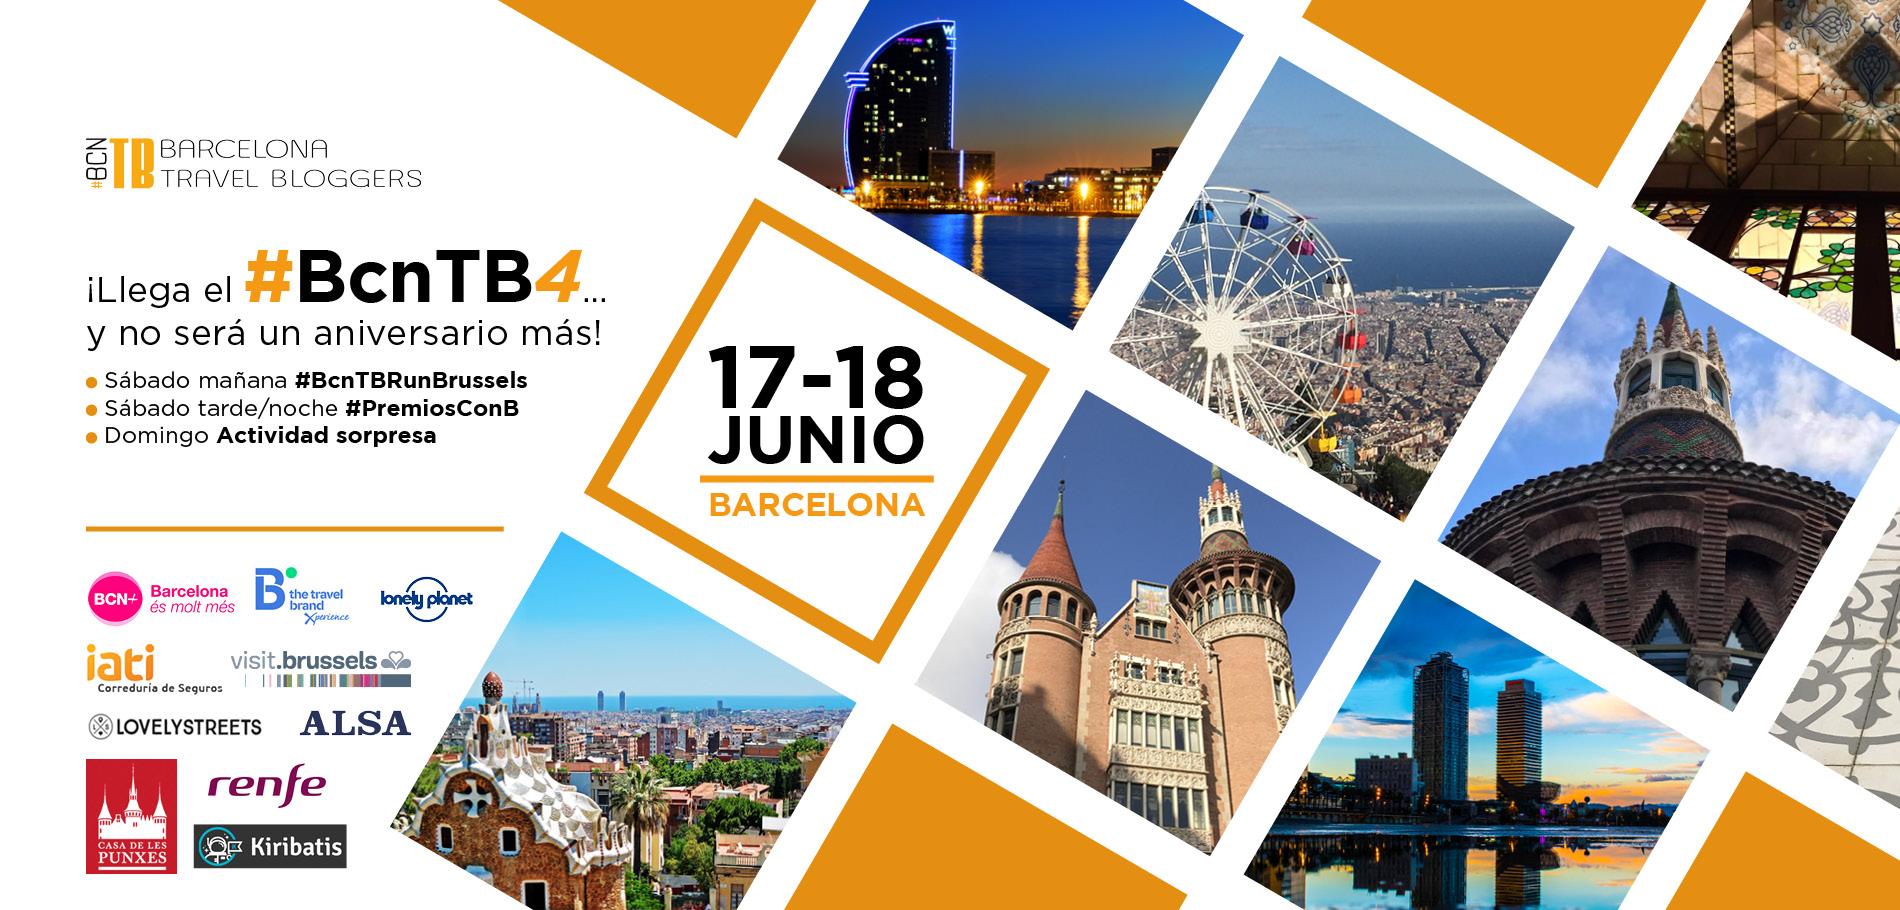 Programa del Cuarto Aniversario Barcelona Travel Bloggers